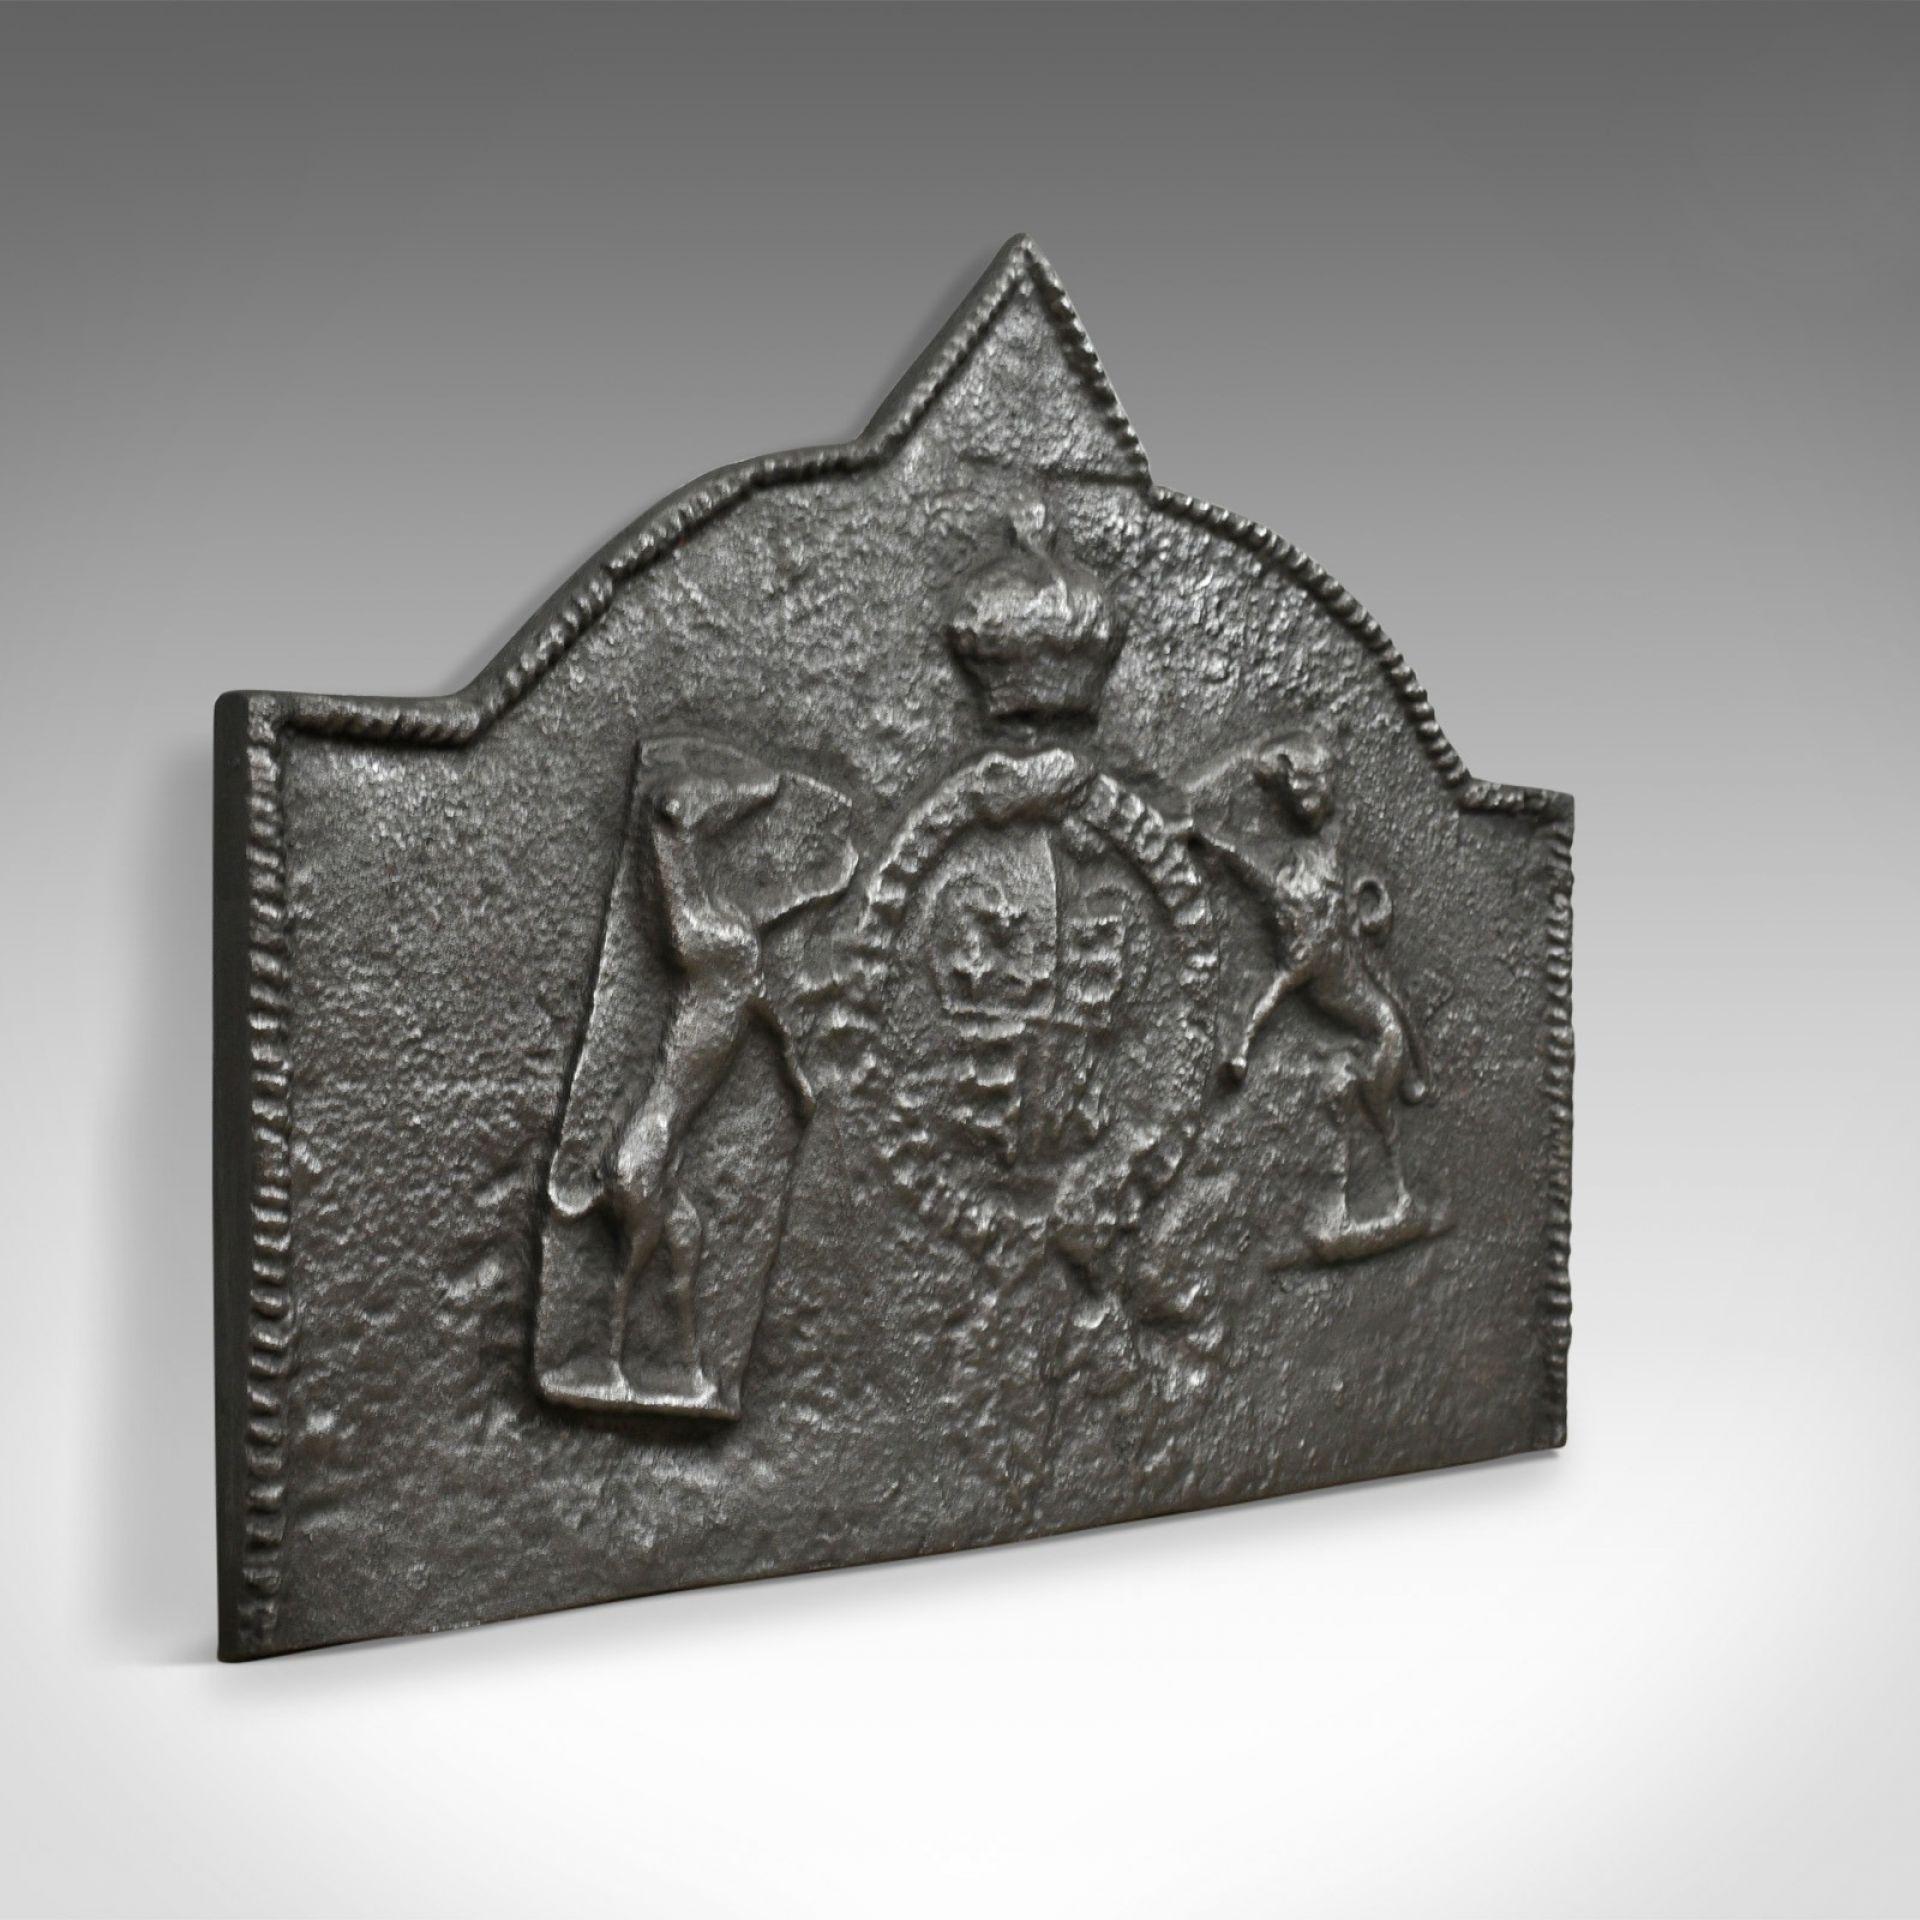 Tudor Revival Cast Iron Fire Back, Royal Crest, Lion, Greyhound, Victorian c1890